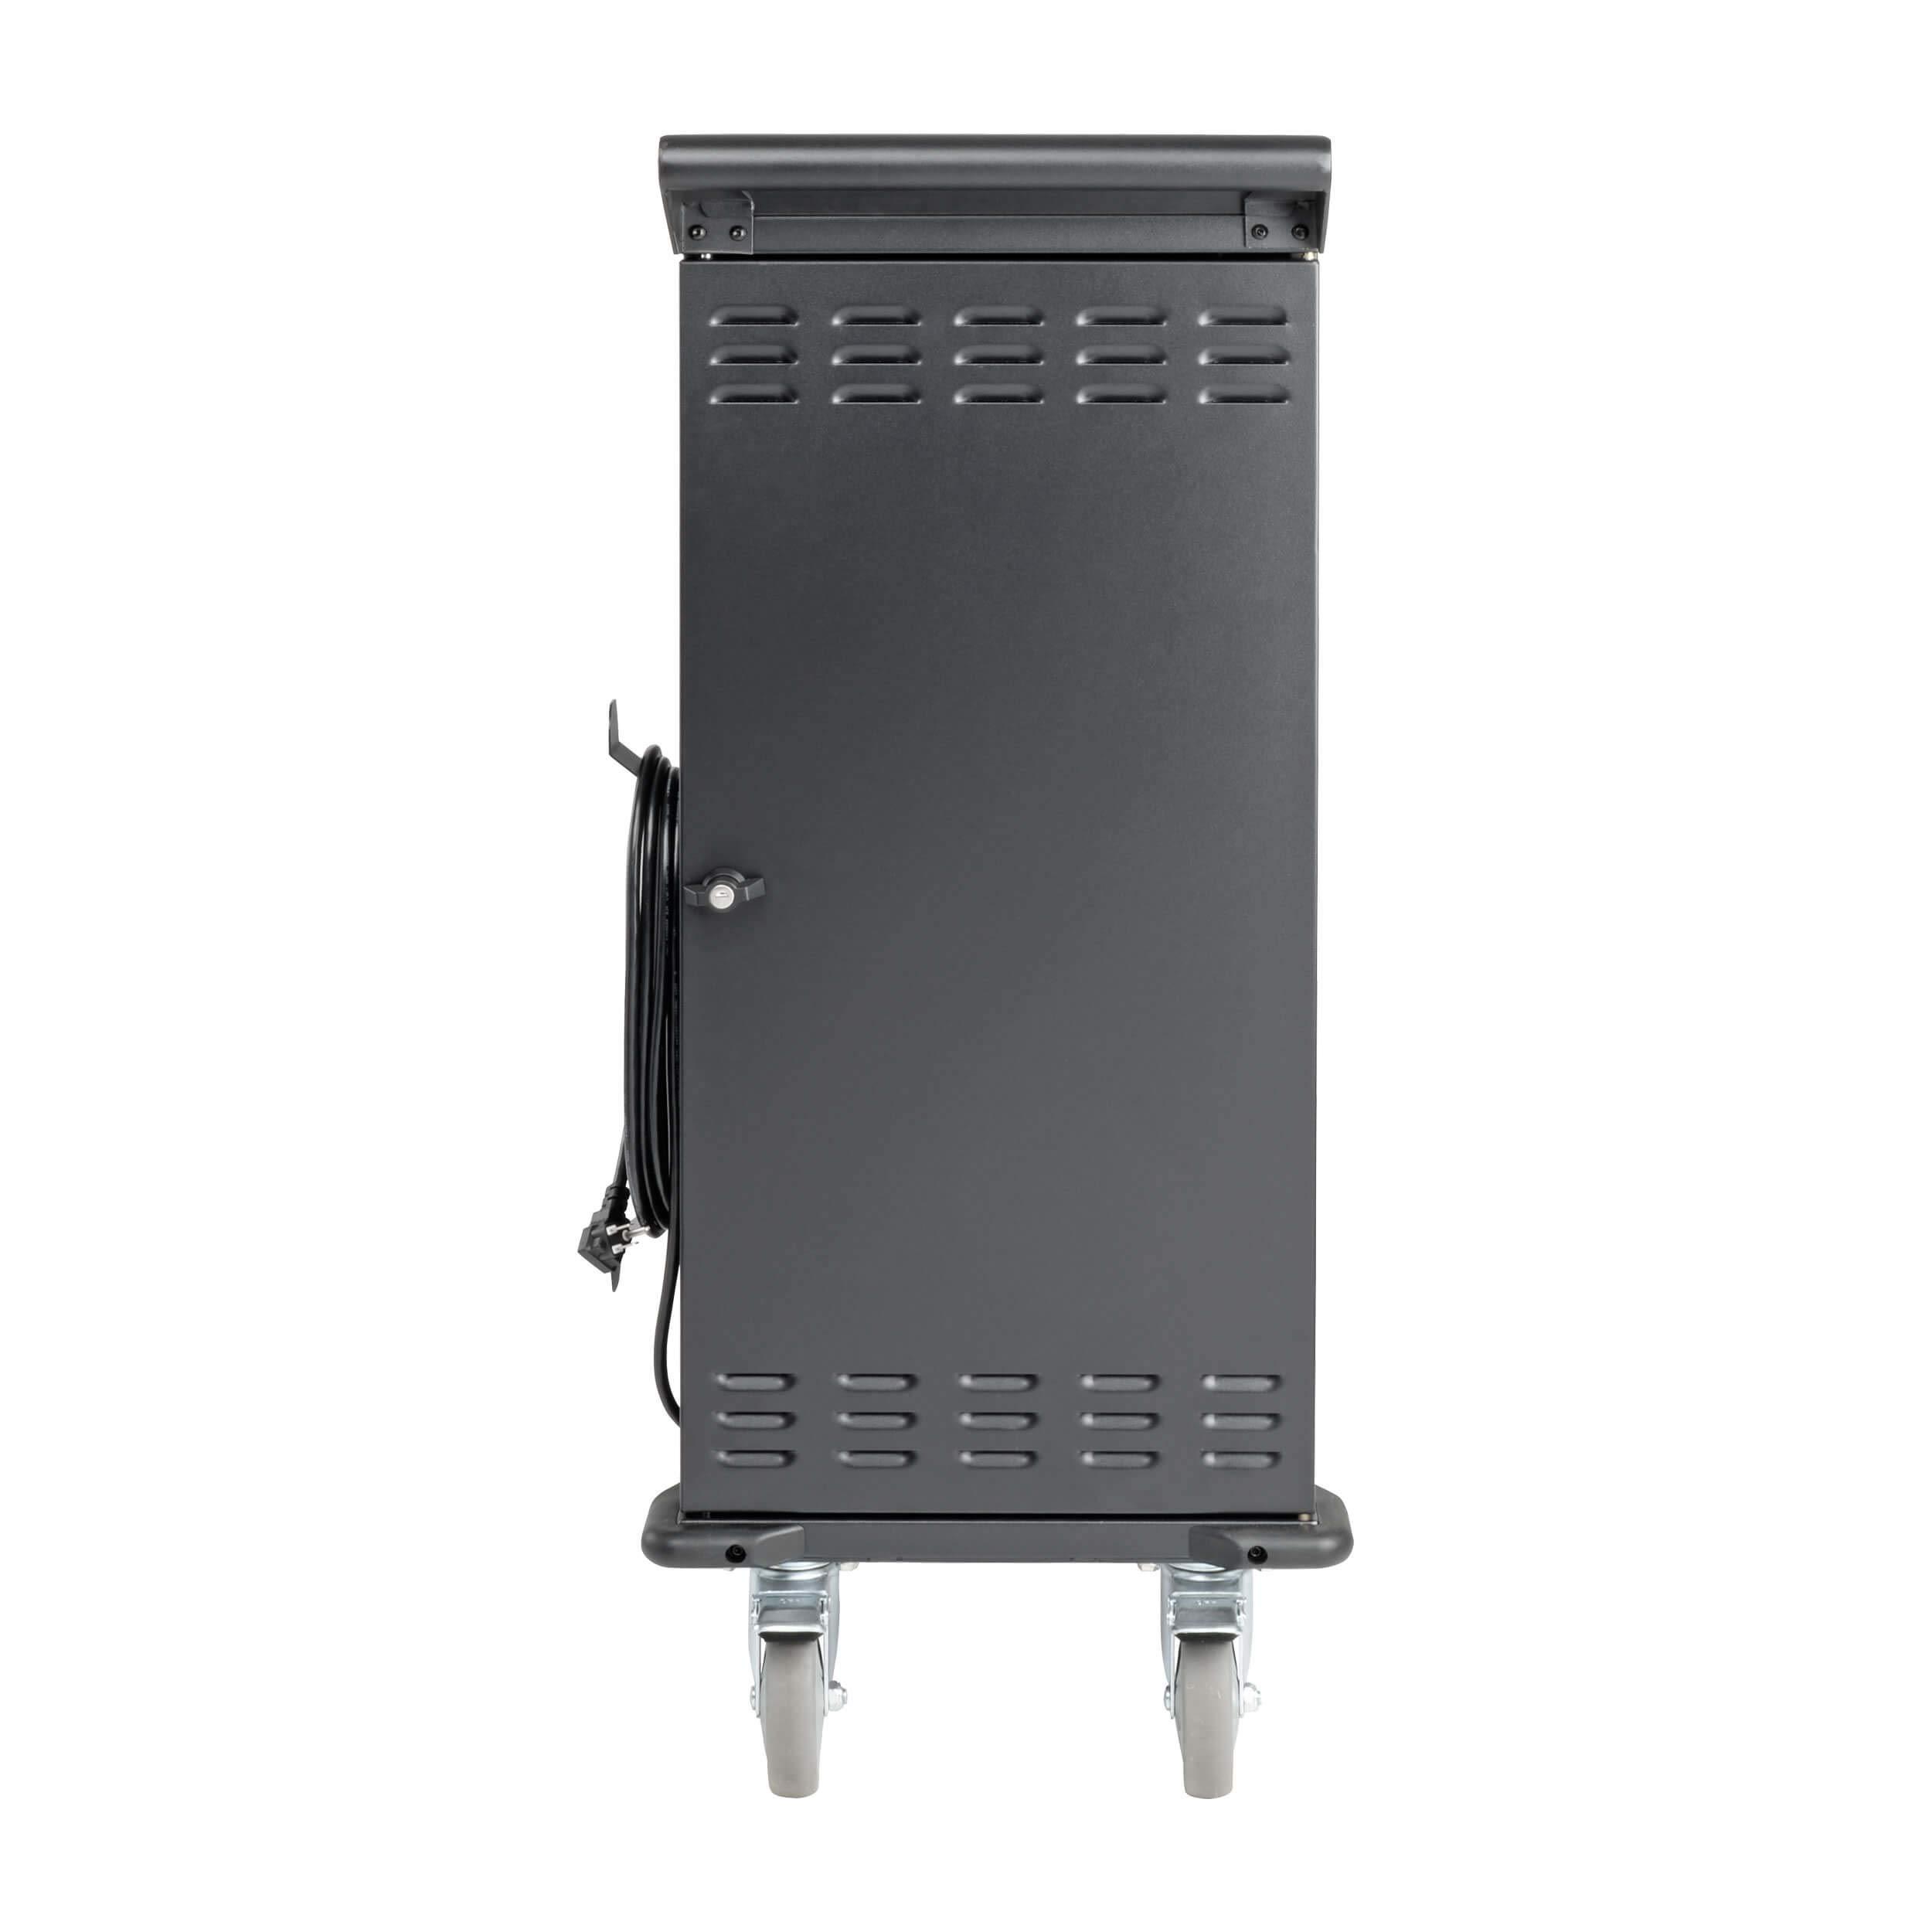 Tripp Lite 27-Port AC Mobile Charging Cart Storage Station for Chromebooks, iPads, Laptops, Tablets, Black (CSC27AC) by Tripp Lite (Image #4)